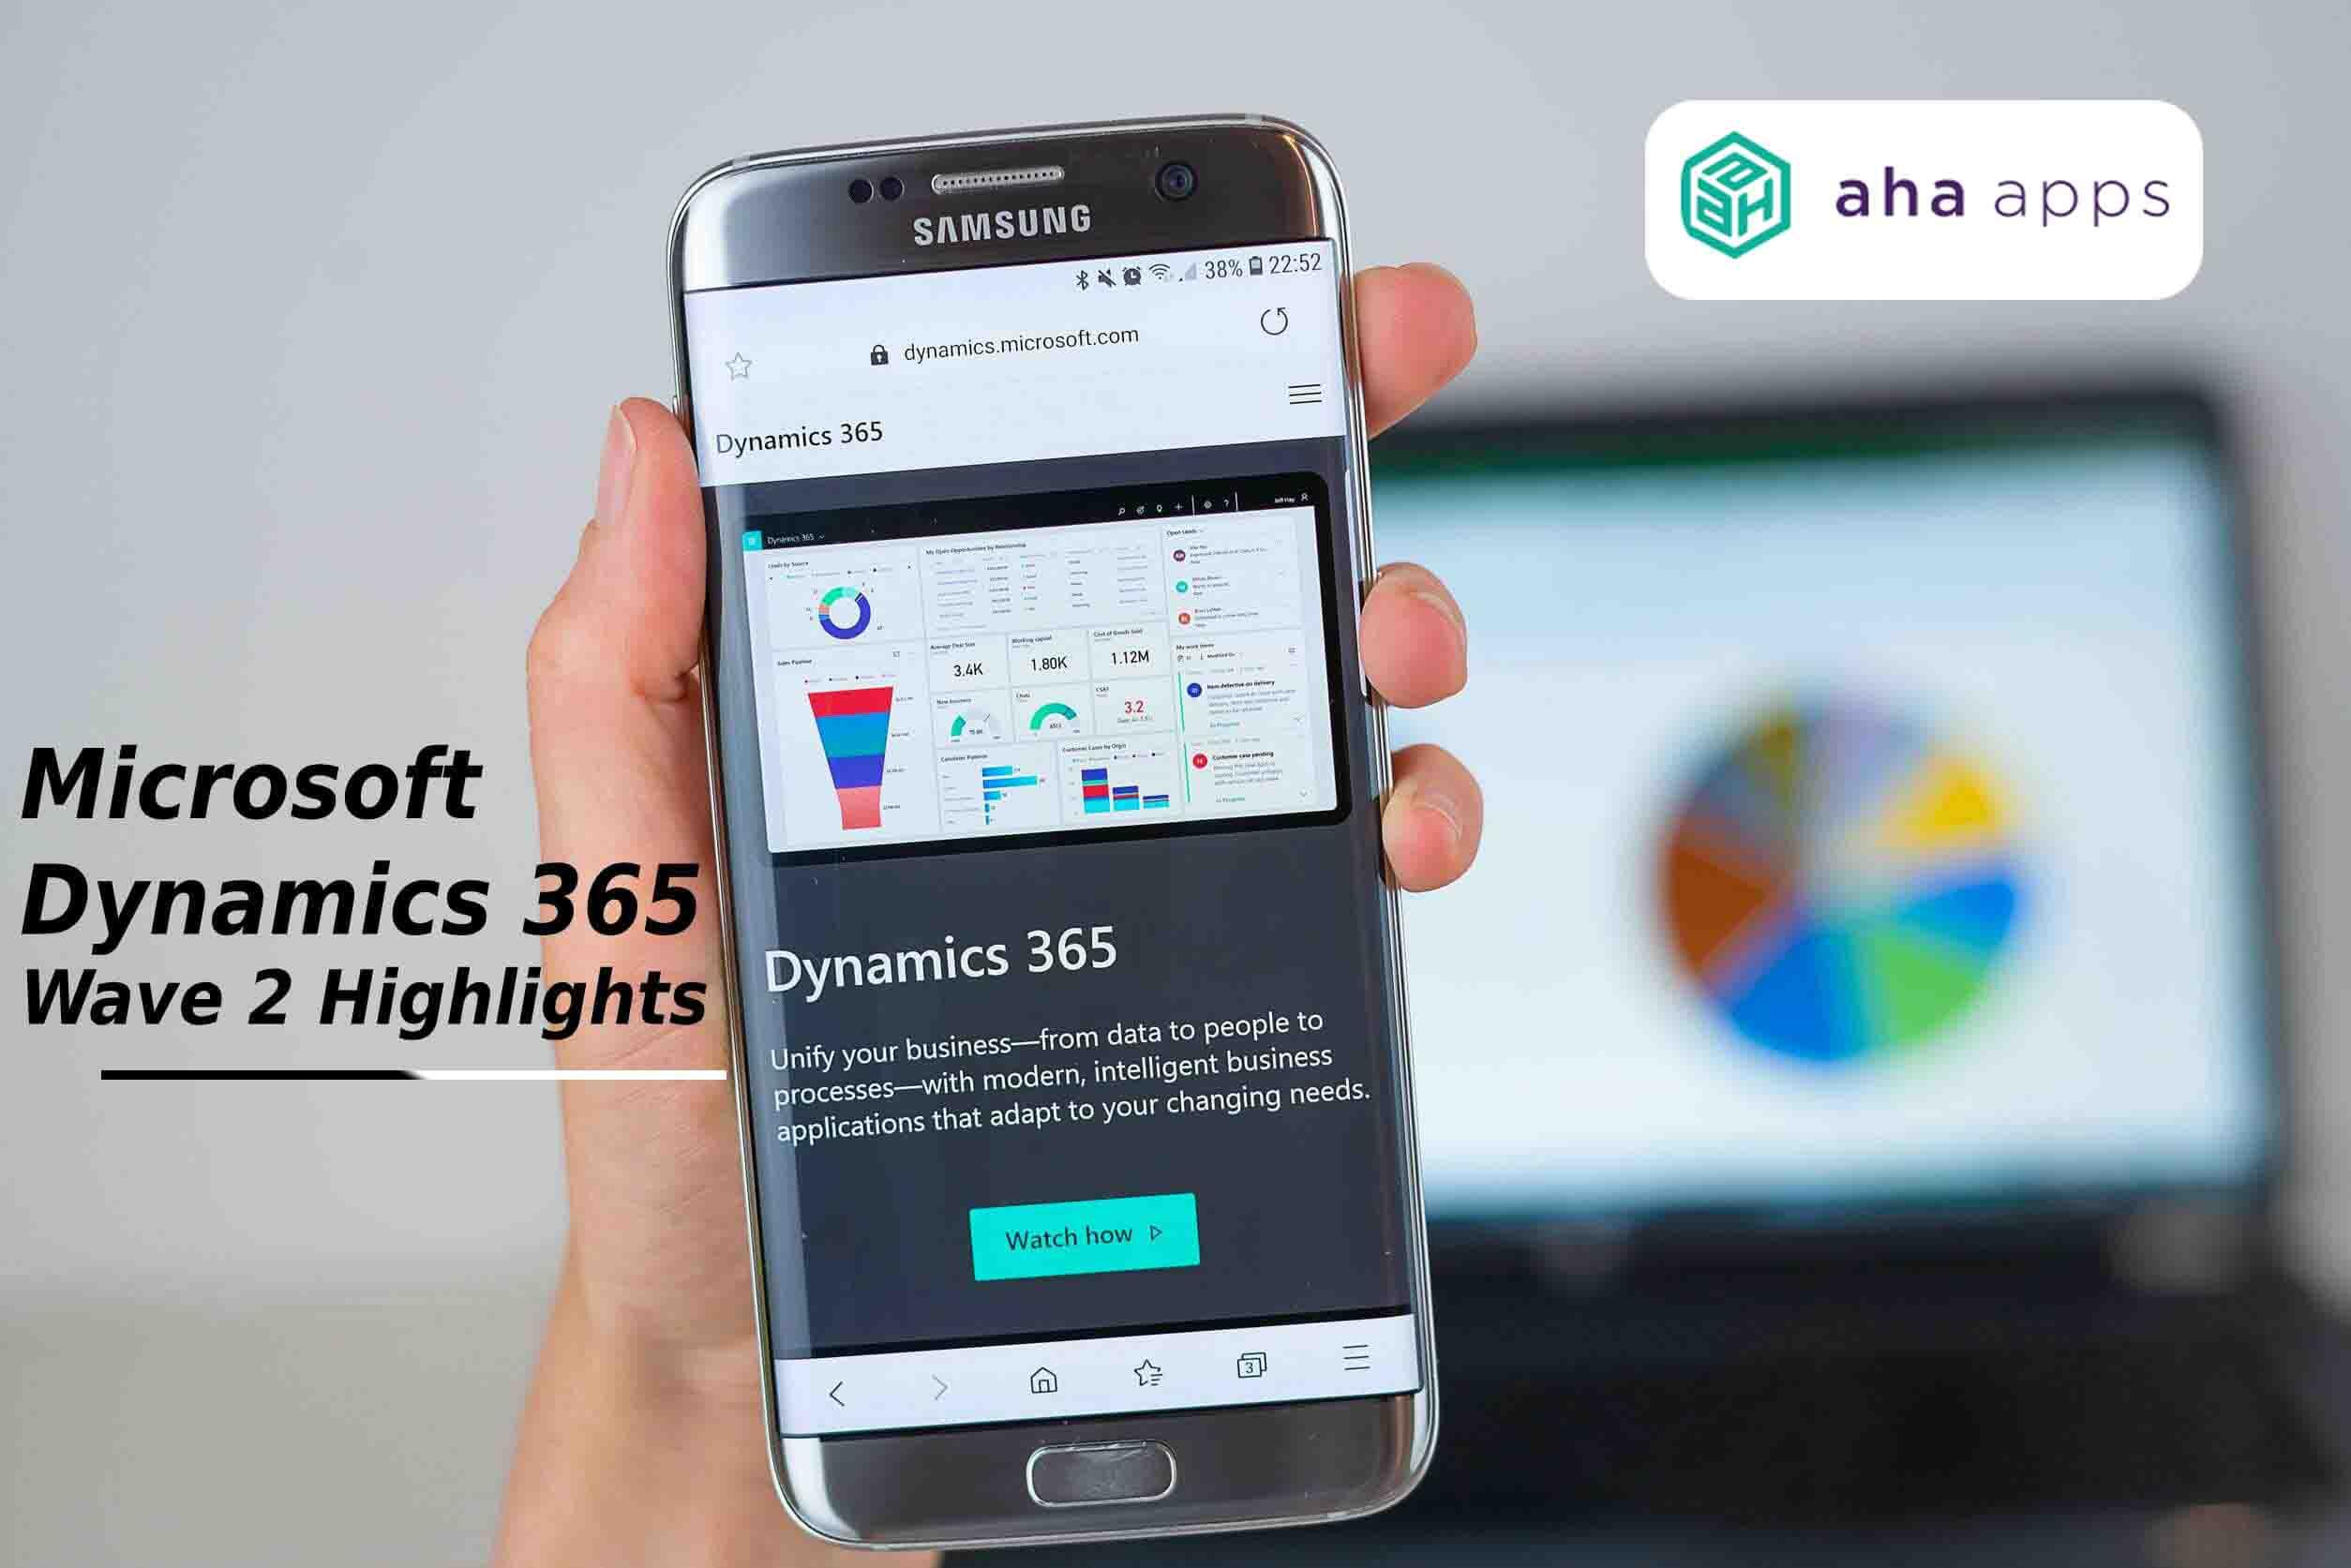 Microsoft Dynamics 365 Wave 2 highlights - AhaApps